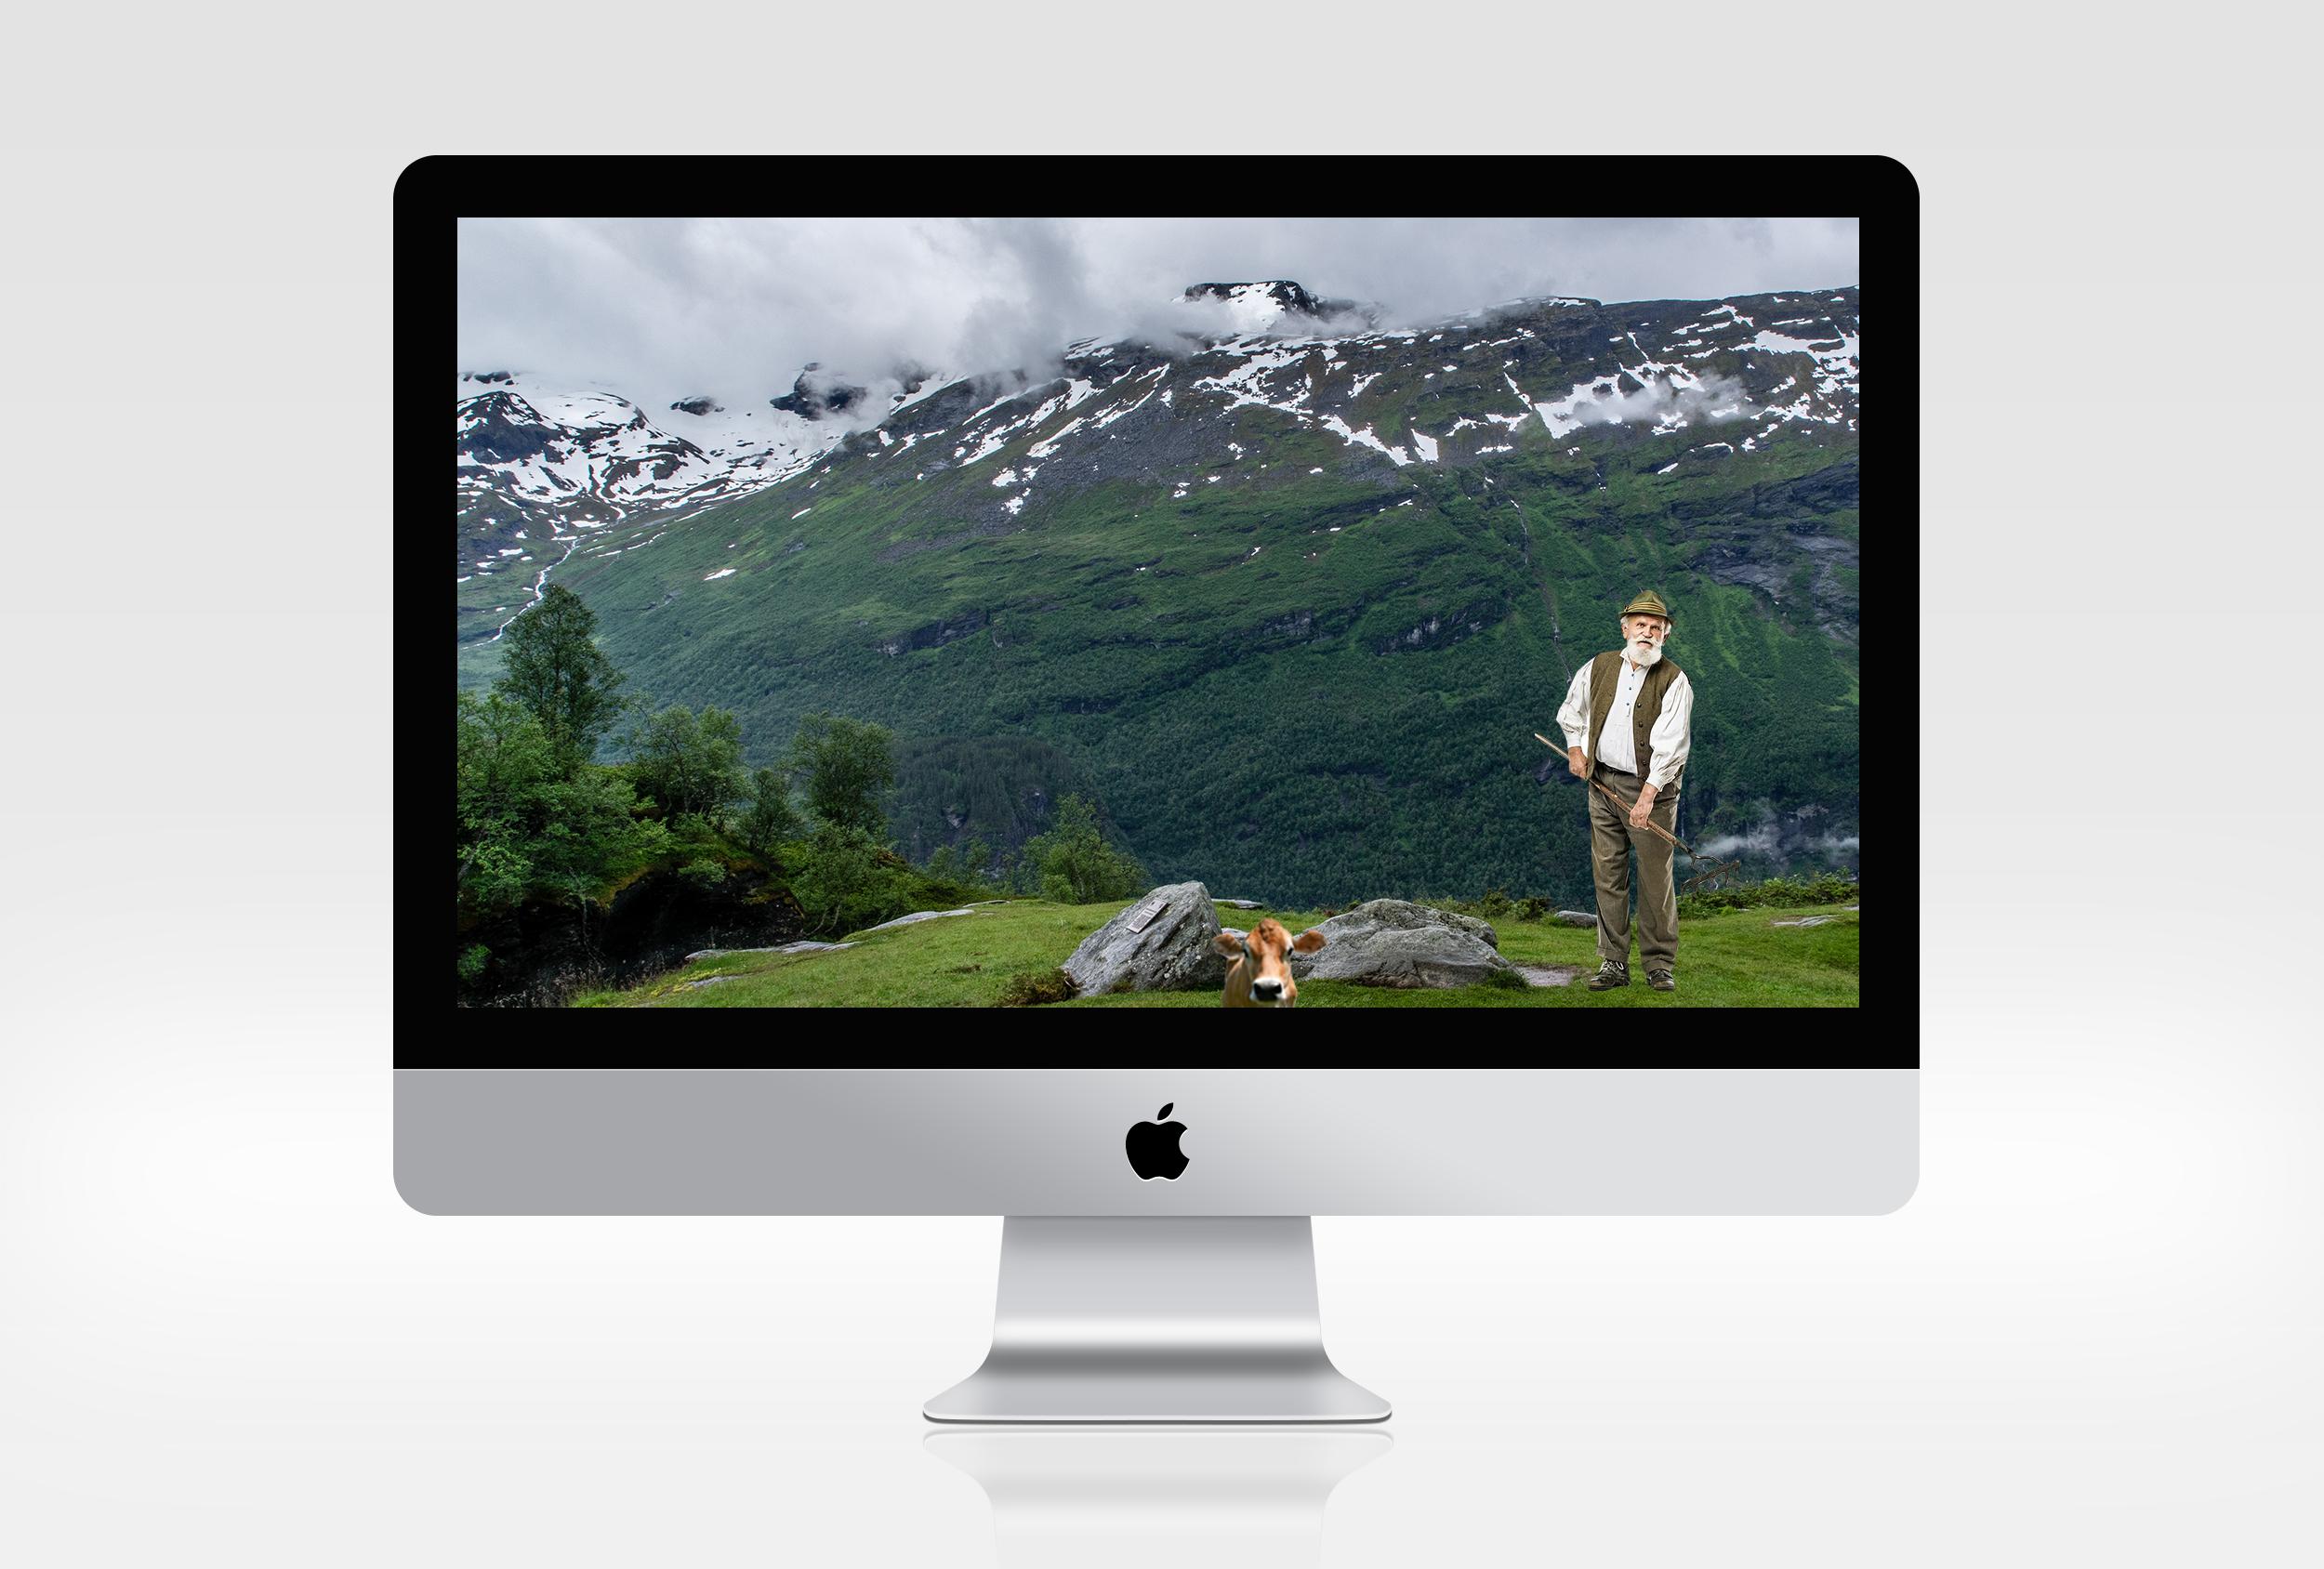 iMac-psd-mockup-template-8.png